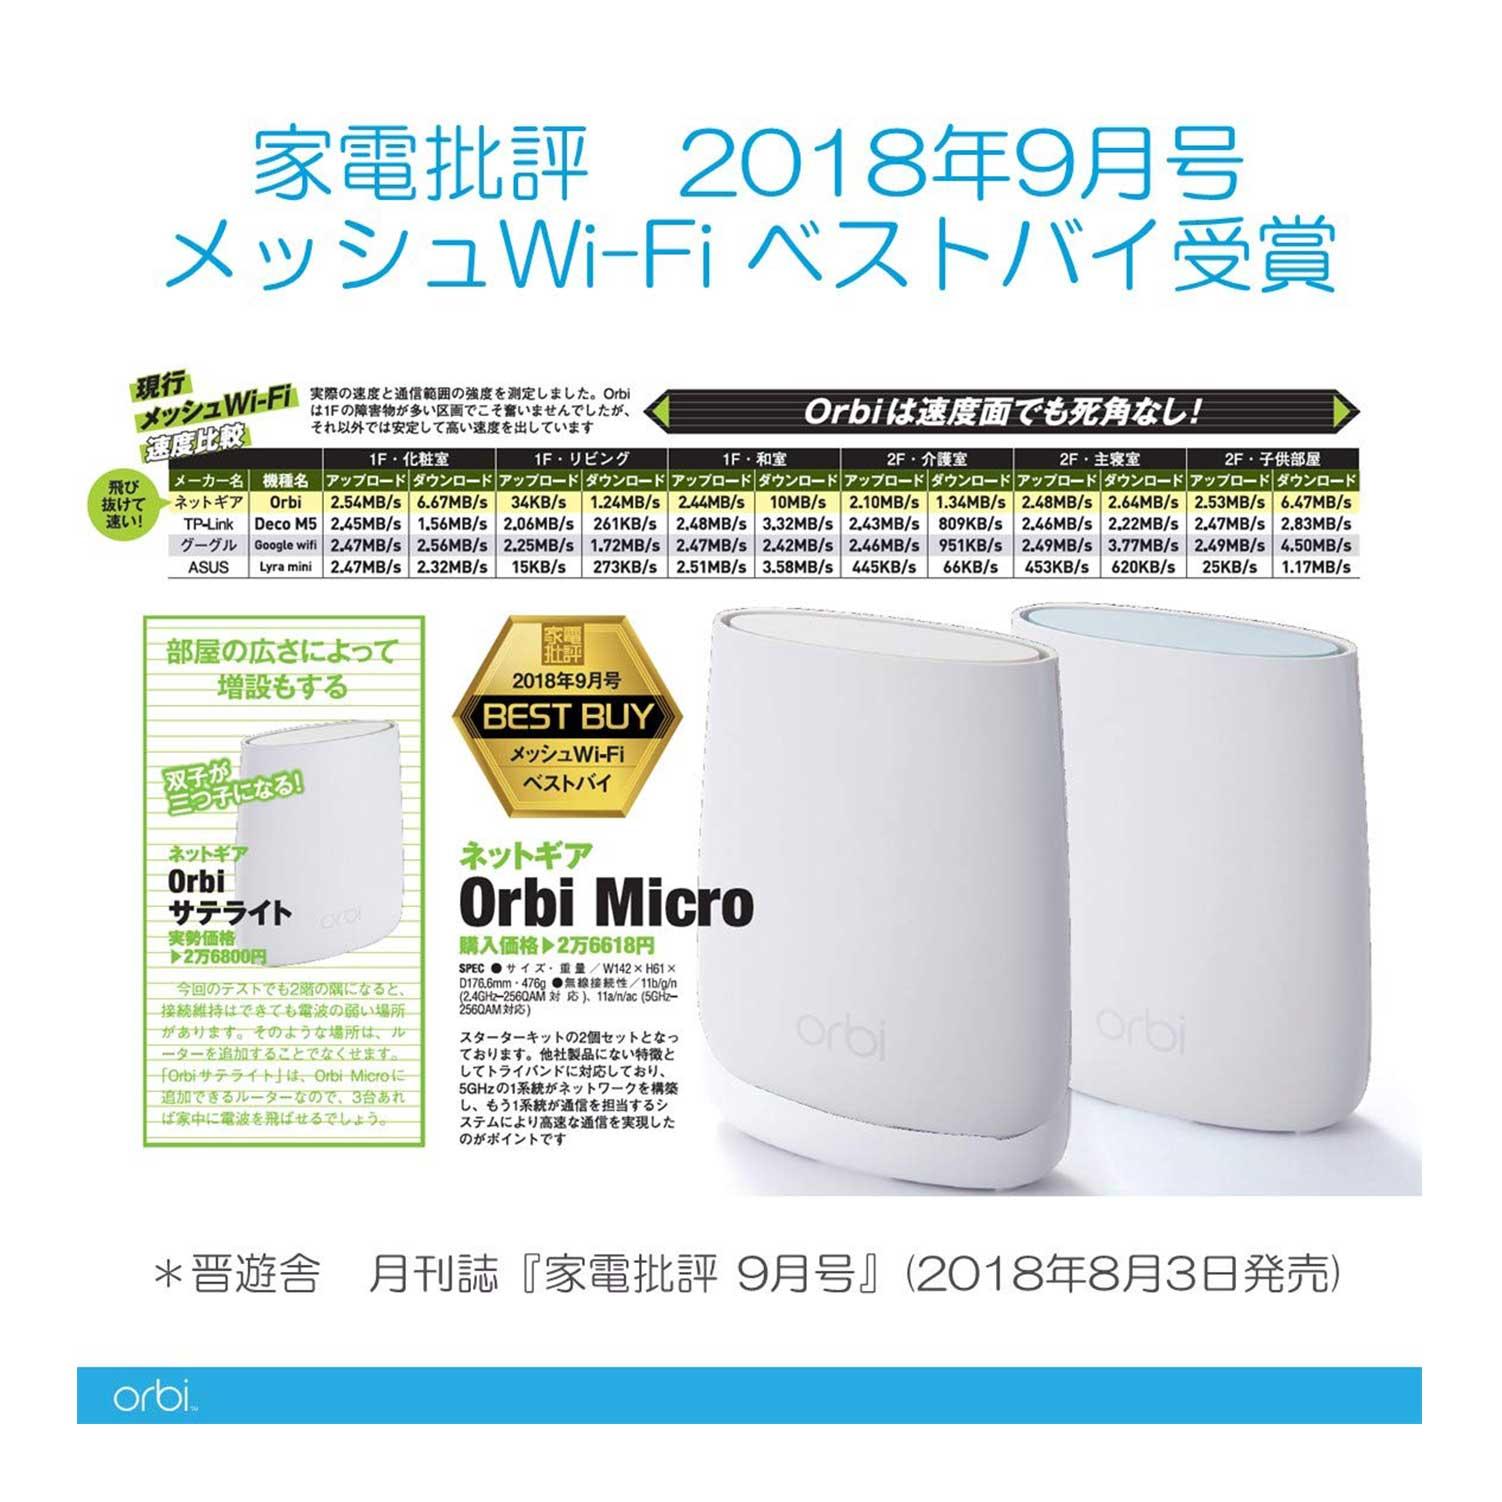 Orbi Micro